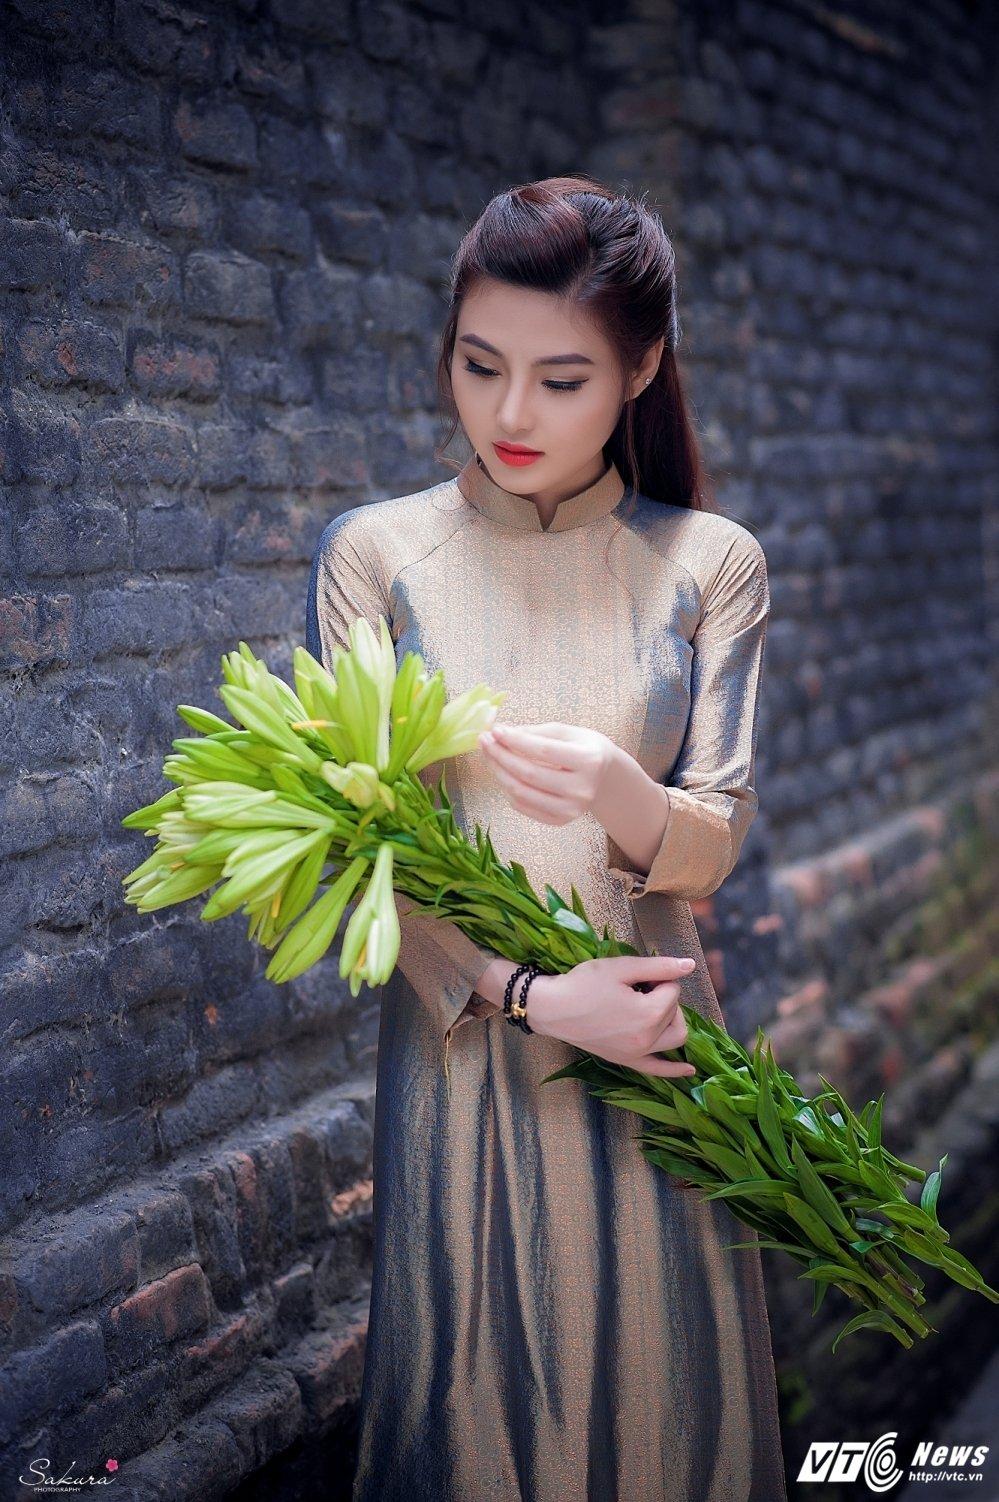 Hot girl xu Thanh xinh dep, khoe dang chuan trong ta ao dai van nguoi me hinh anh 5